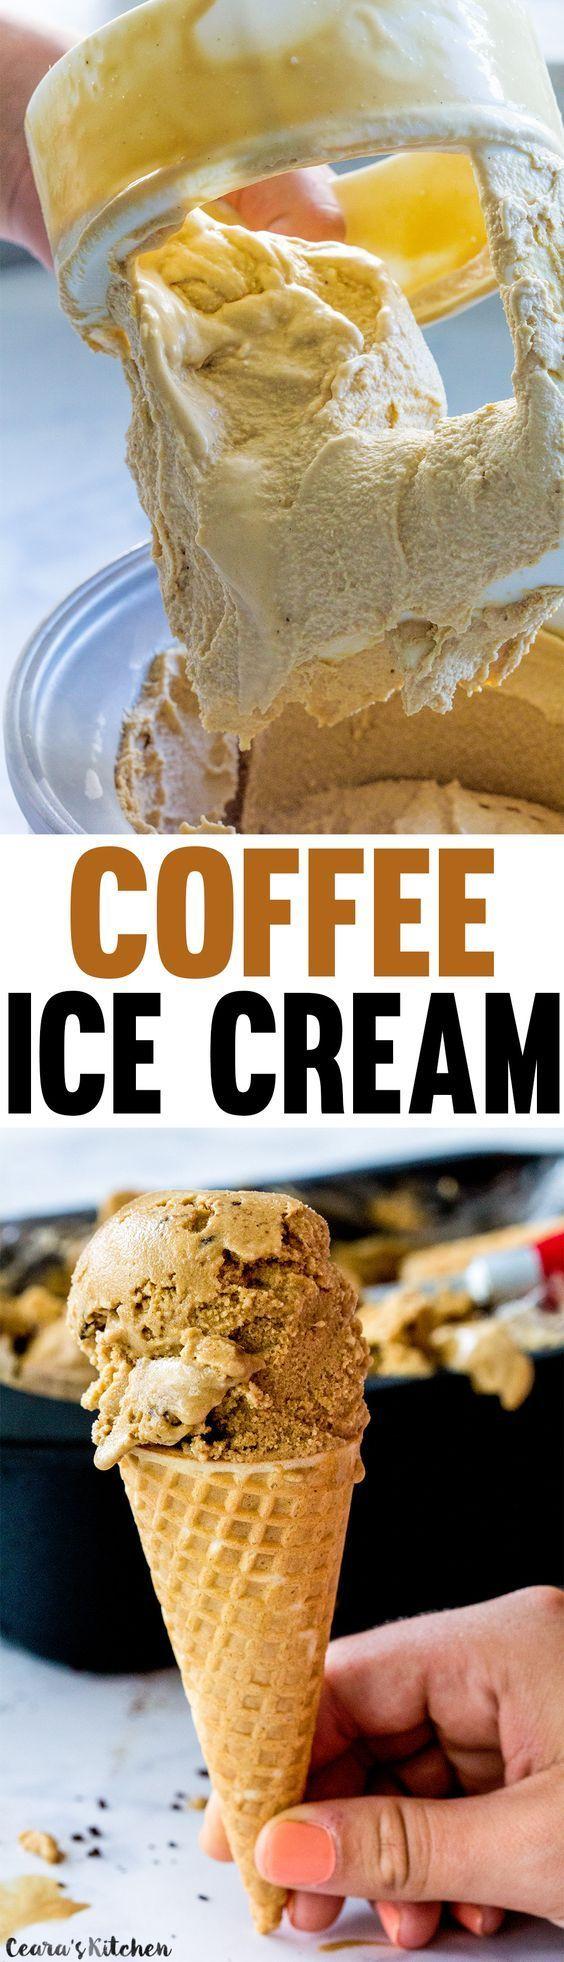 Dairy-Free Coffee Ice Cream made with #aquafaba and coconut sugar. The aquafaba makes the ice cream SO fluffy!! #Vegan #DairyFree #IceCream